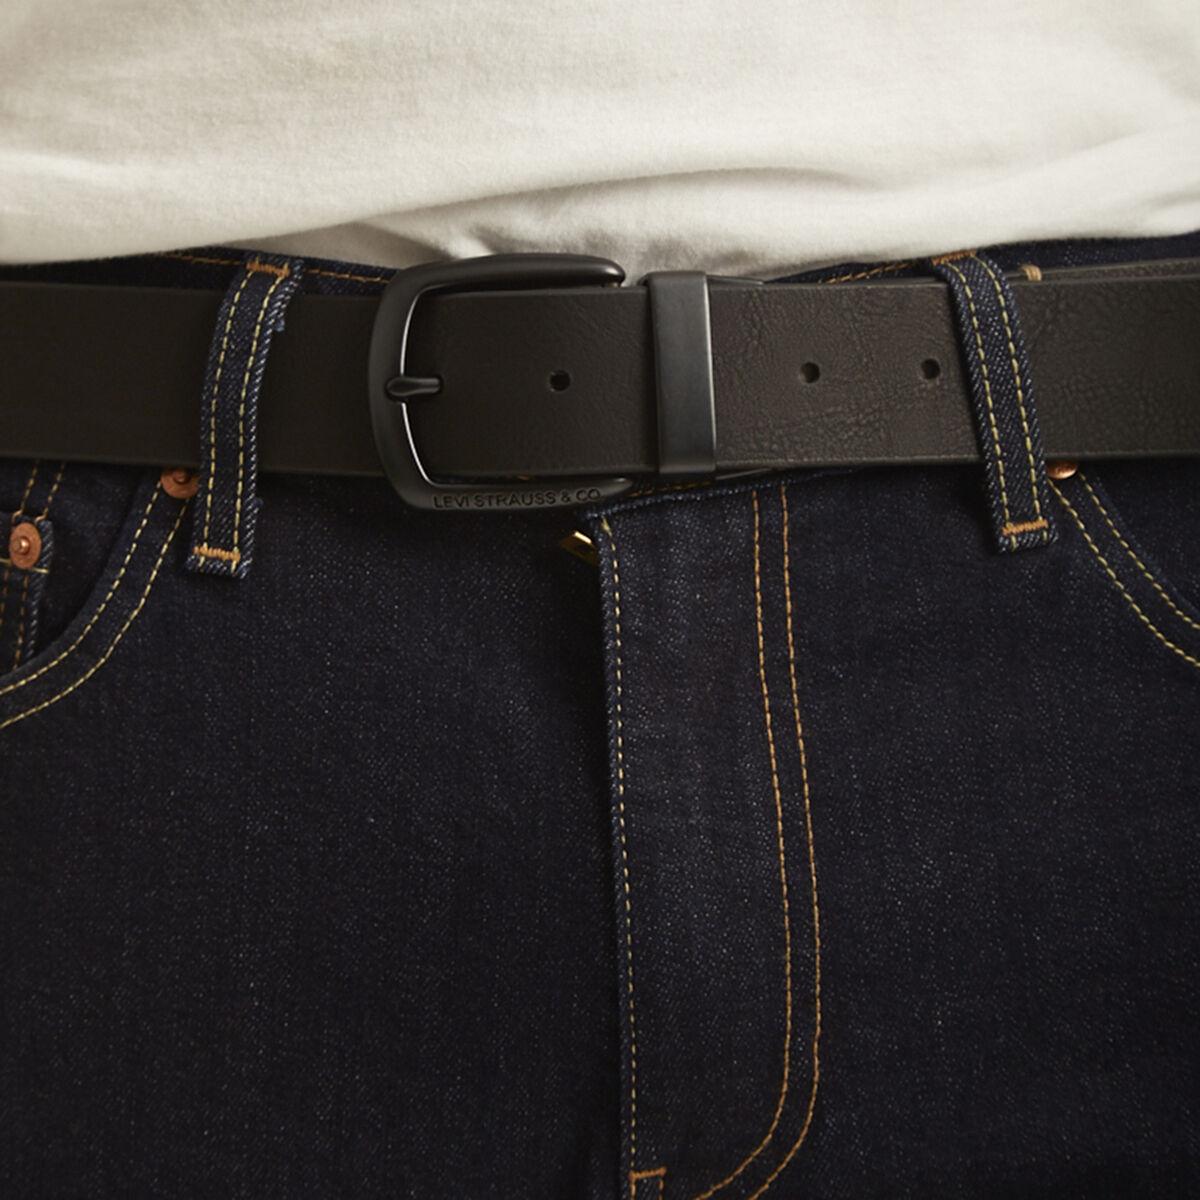 Cinturón Levis Negra